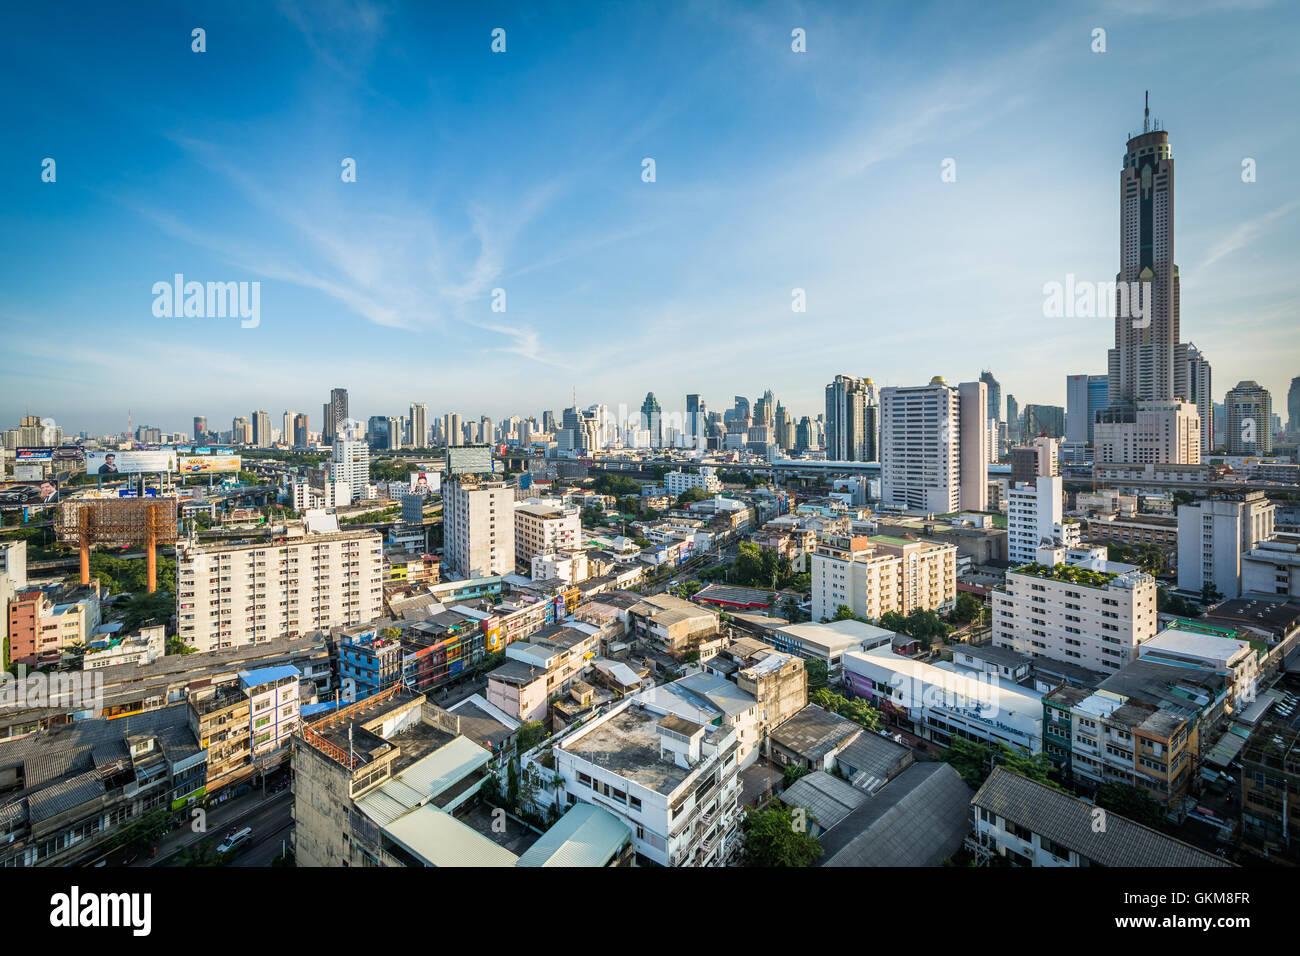 Vista de la Ratchathewi District, en Bangkok, Tailandia. Imagen De Stock